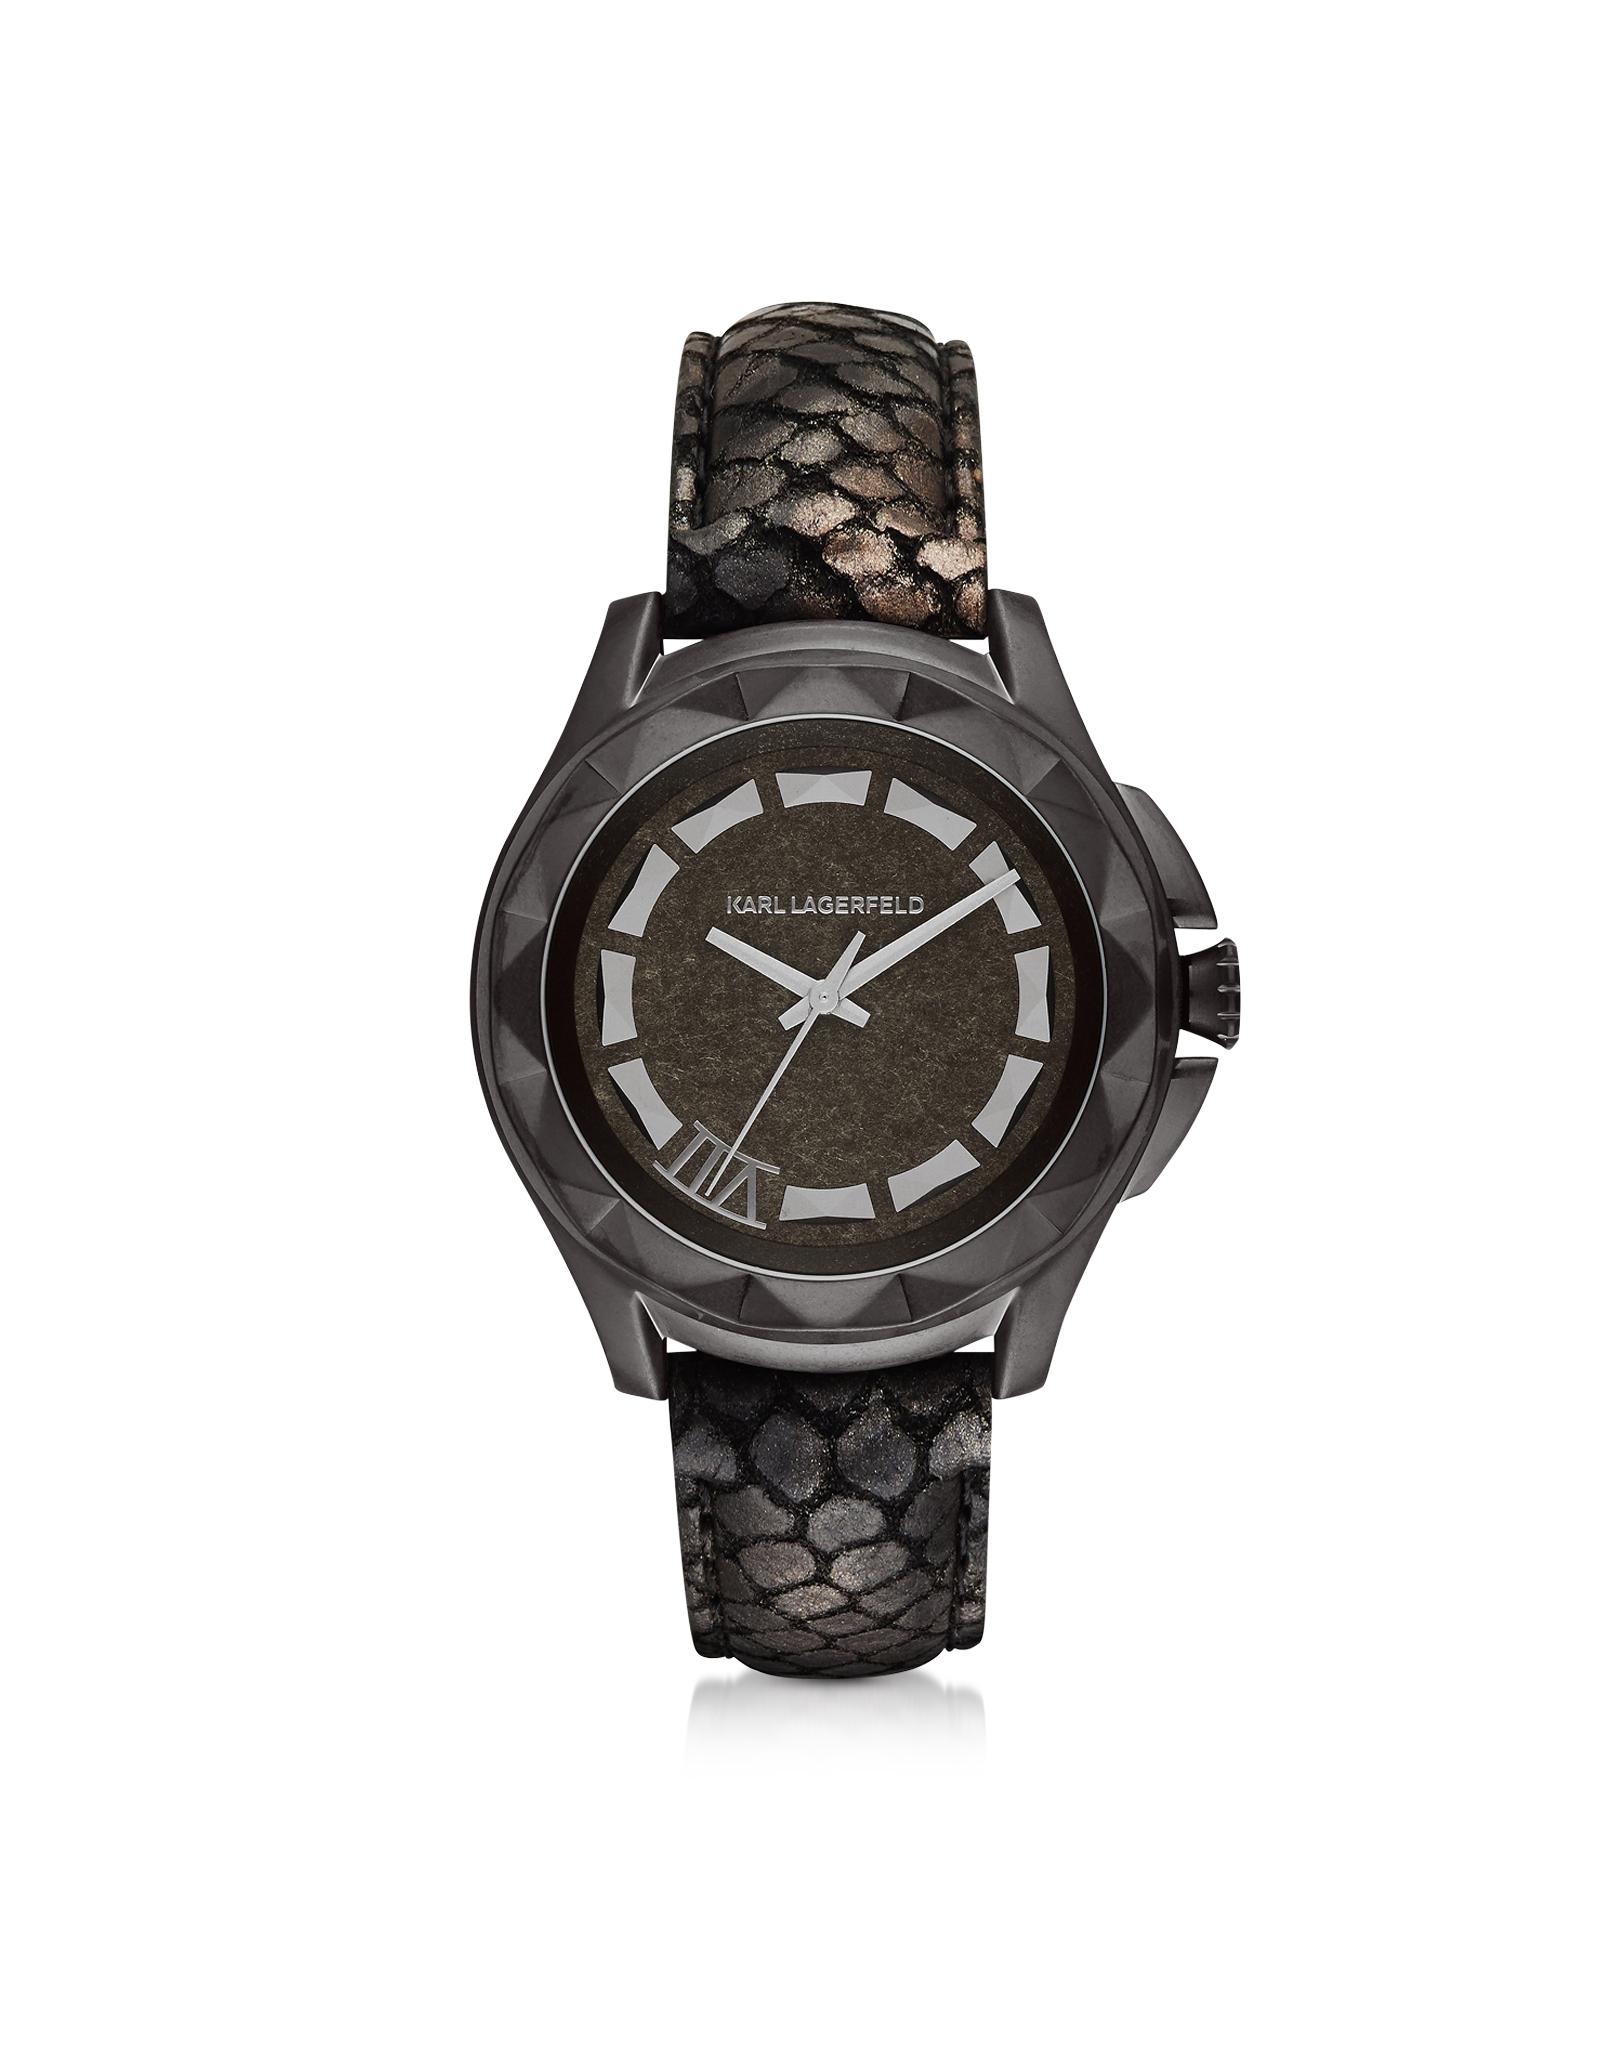 lyst karl lagerfeld karl 7 44mm python embossed metallic leather band unisex watch in black. Black Bedroom Furniture Sets. Home Design Ideas